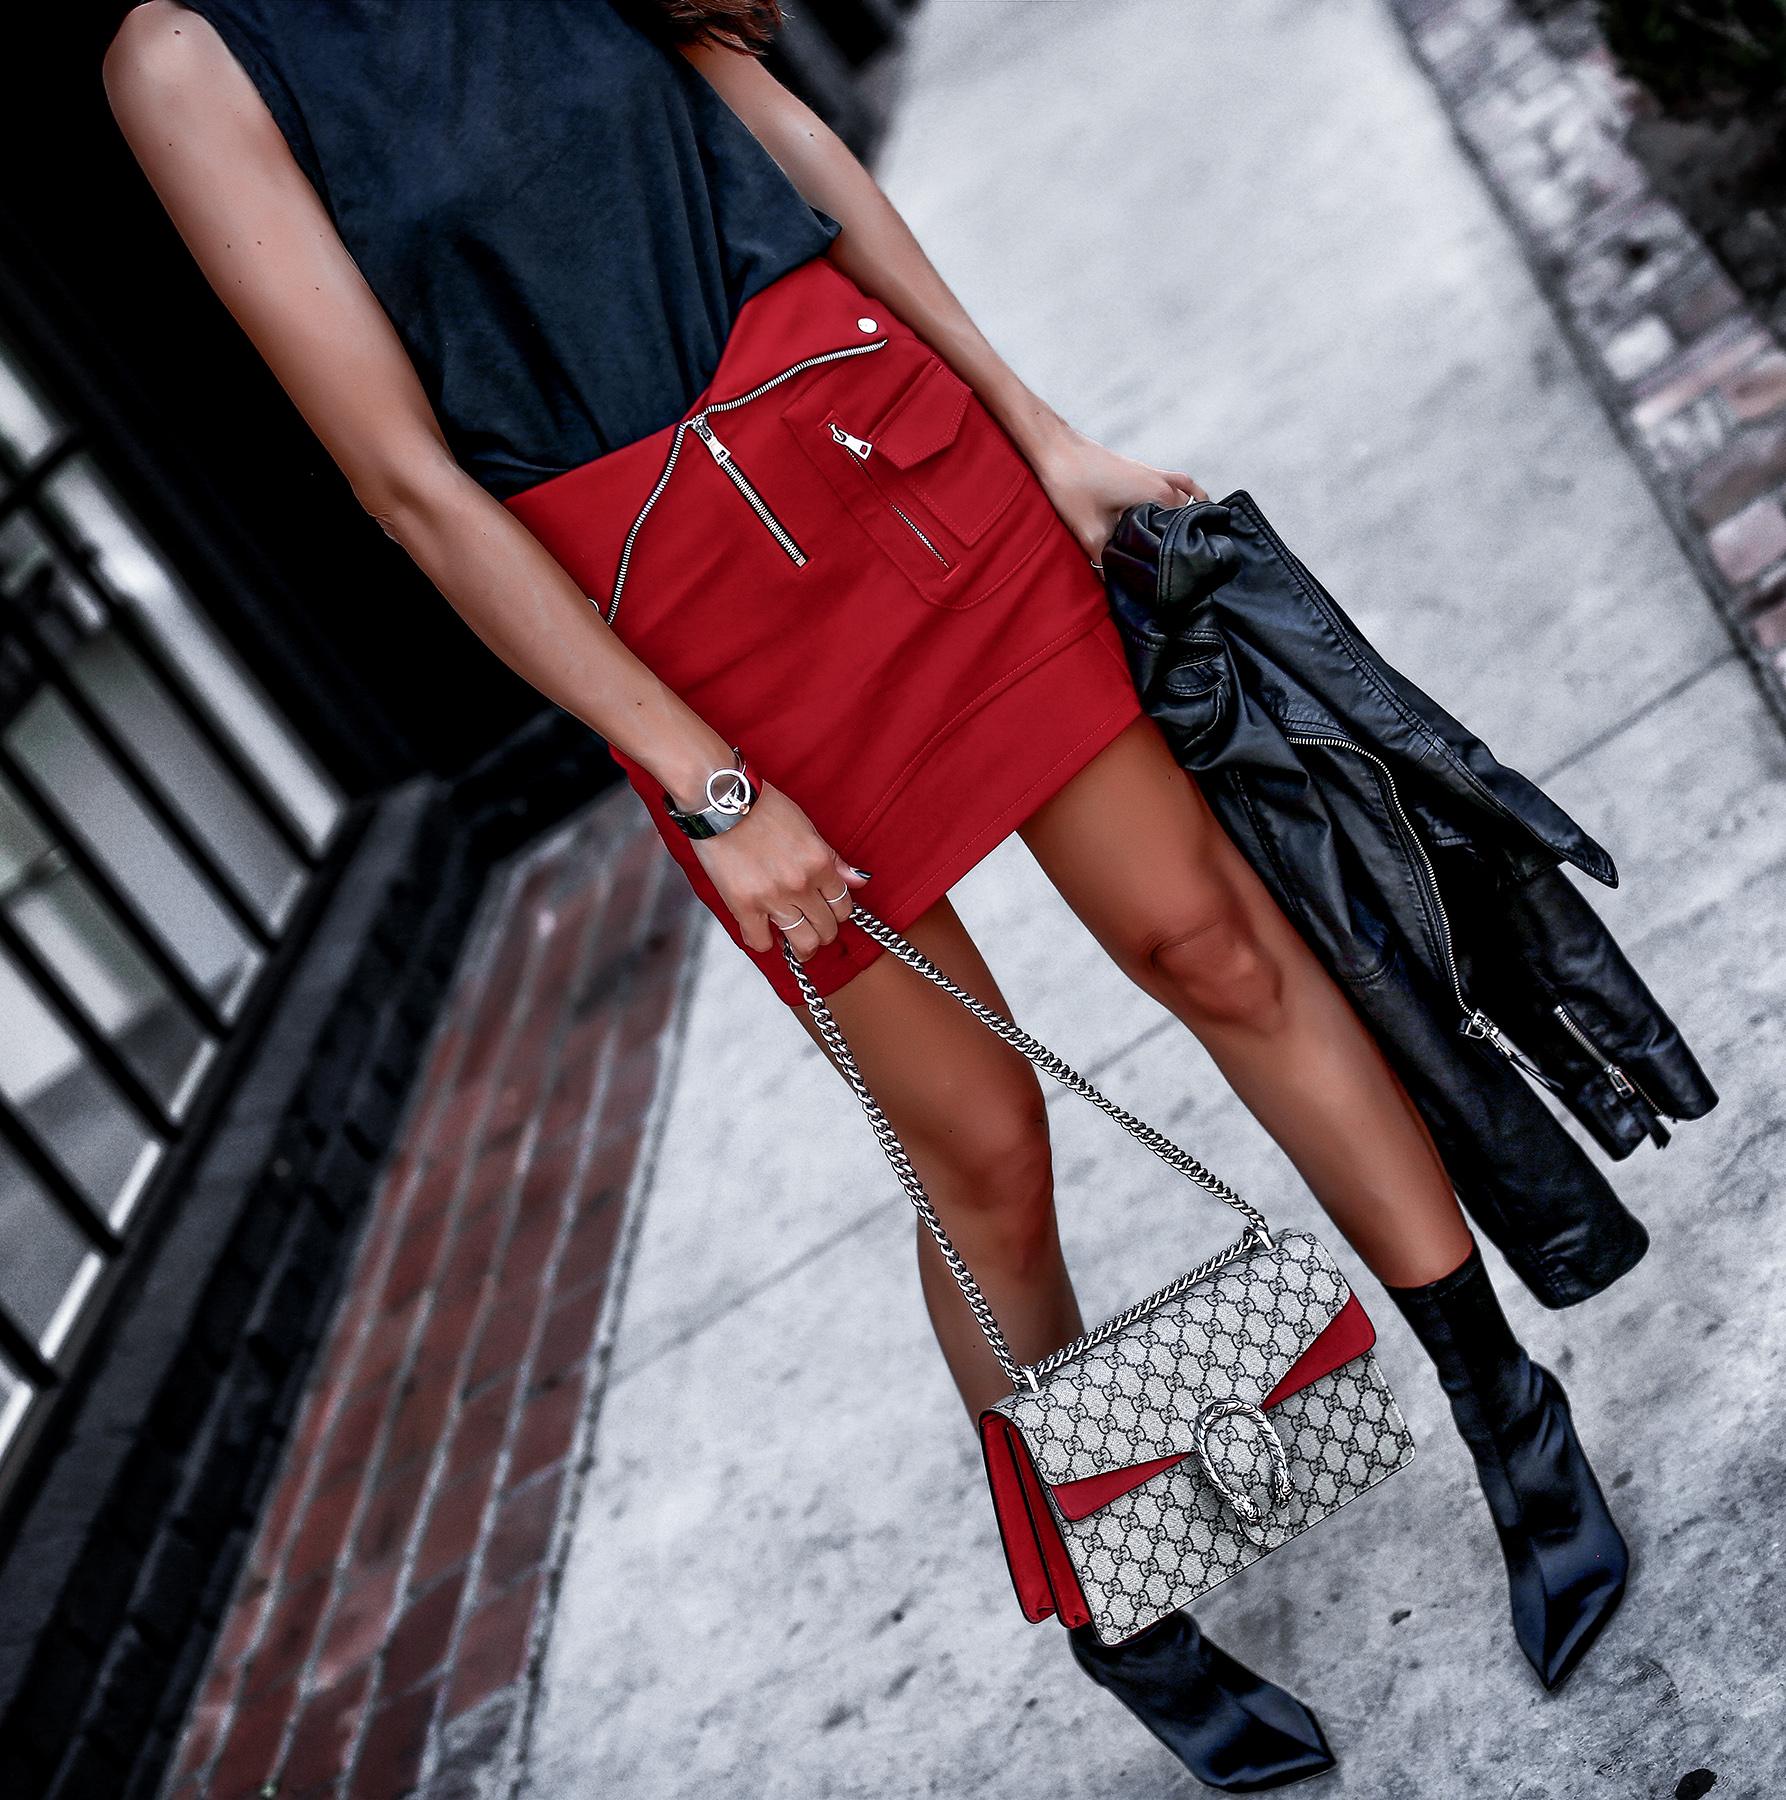 RTA Mini Skirt Tony Bianco Sock Boots Gucci Dionysus Bag.jpg